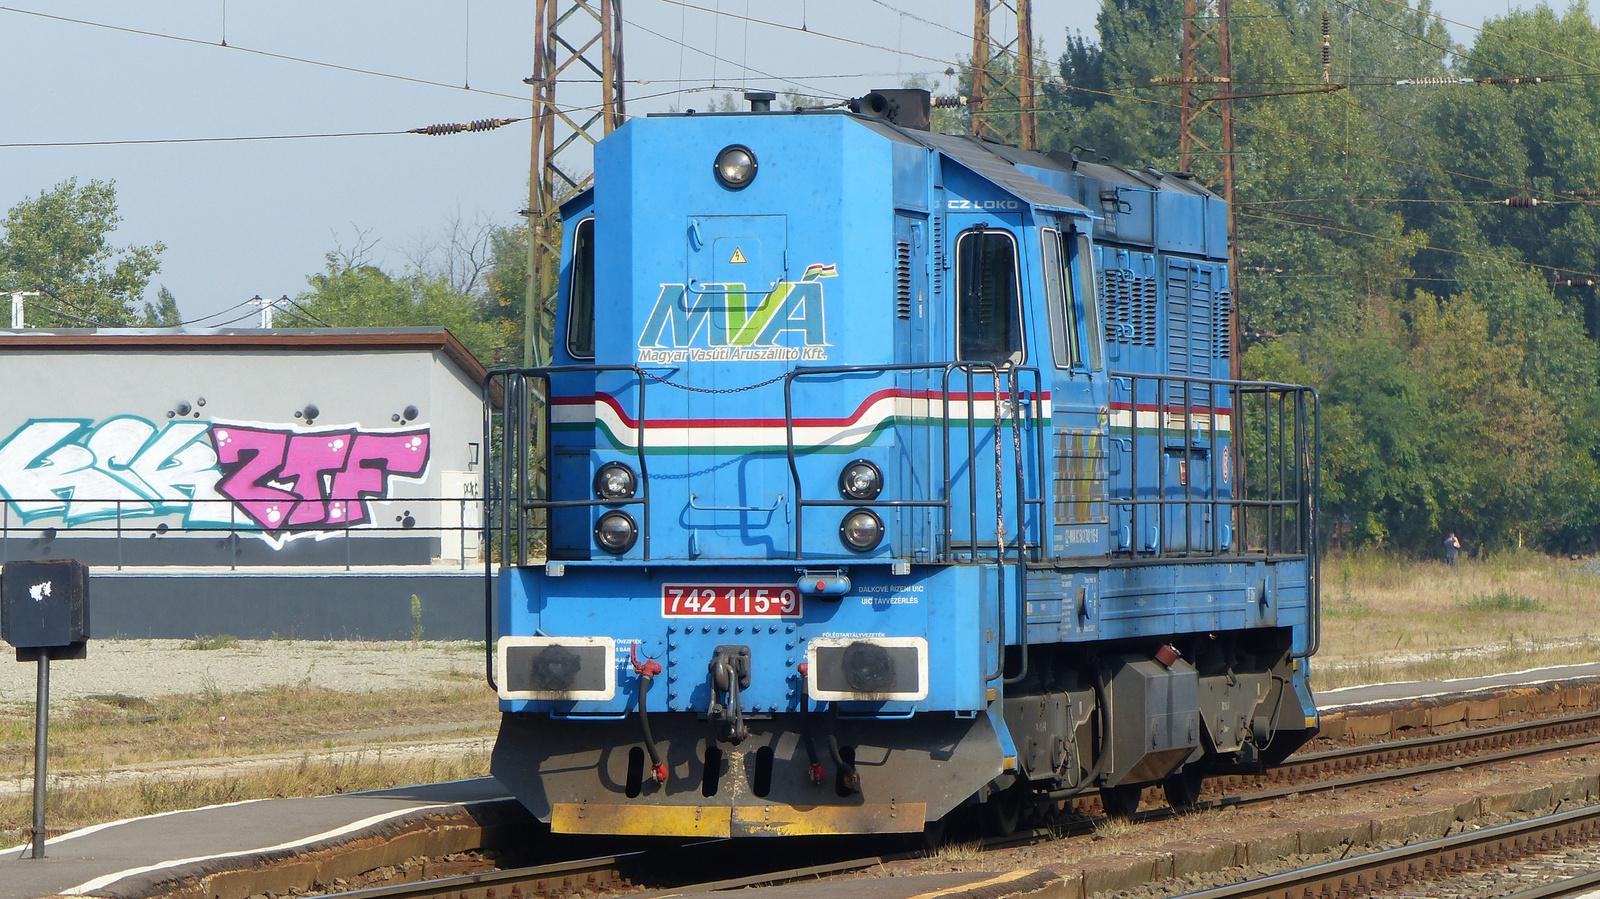 CZ-MVA 92 54 2 742 115-9, SzG3